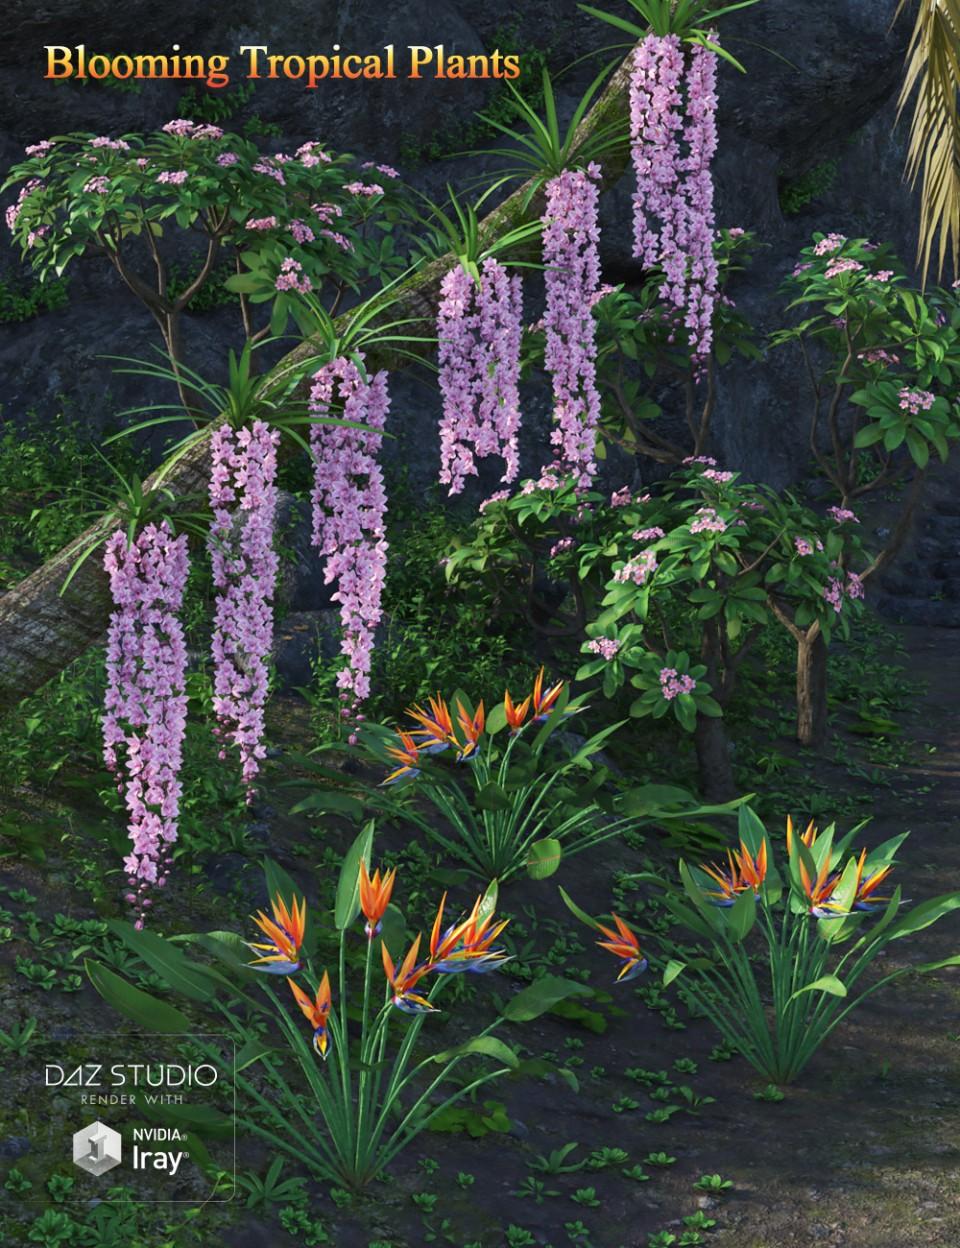 Blooming Tropical Plants_DAZ3D下载站